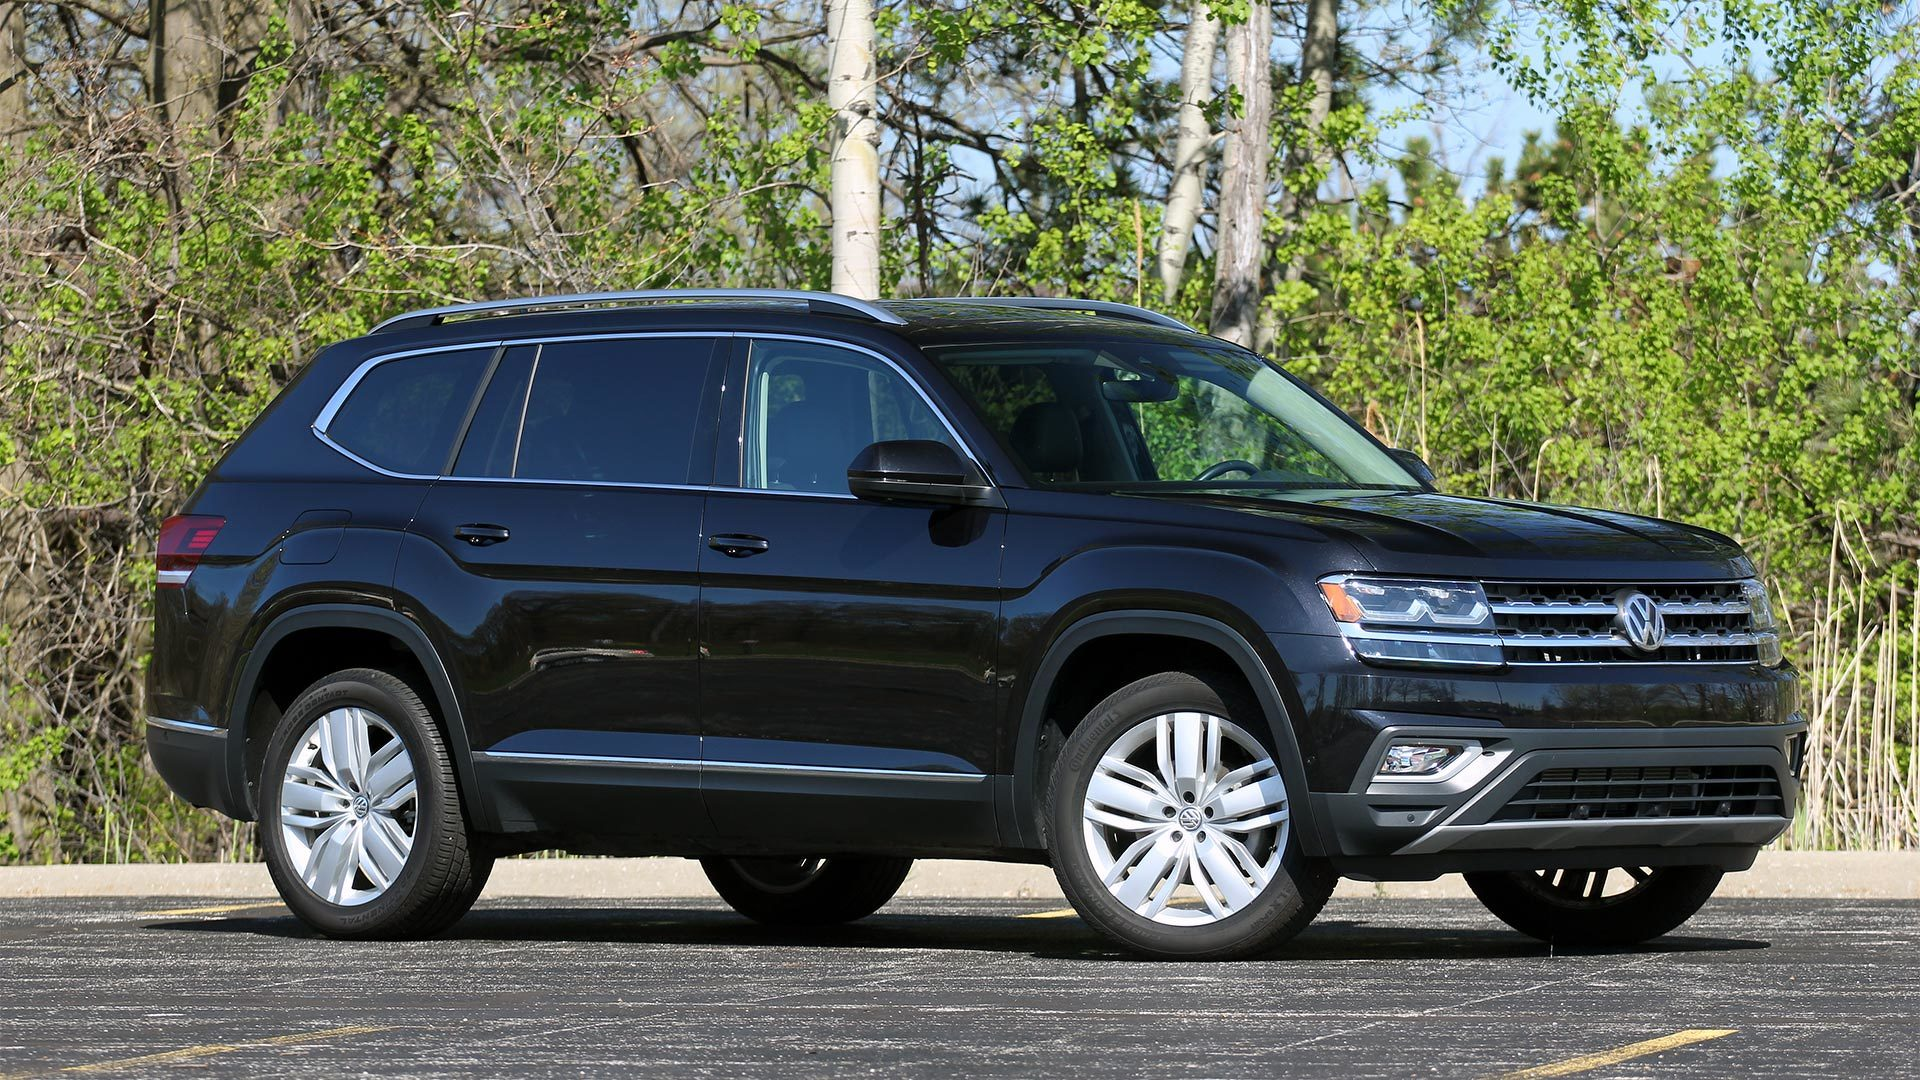 Vw Atlas Towing Capacity >> 2018 Volkswagen Atlas Review: A Big Deal